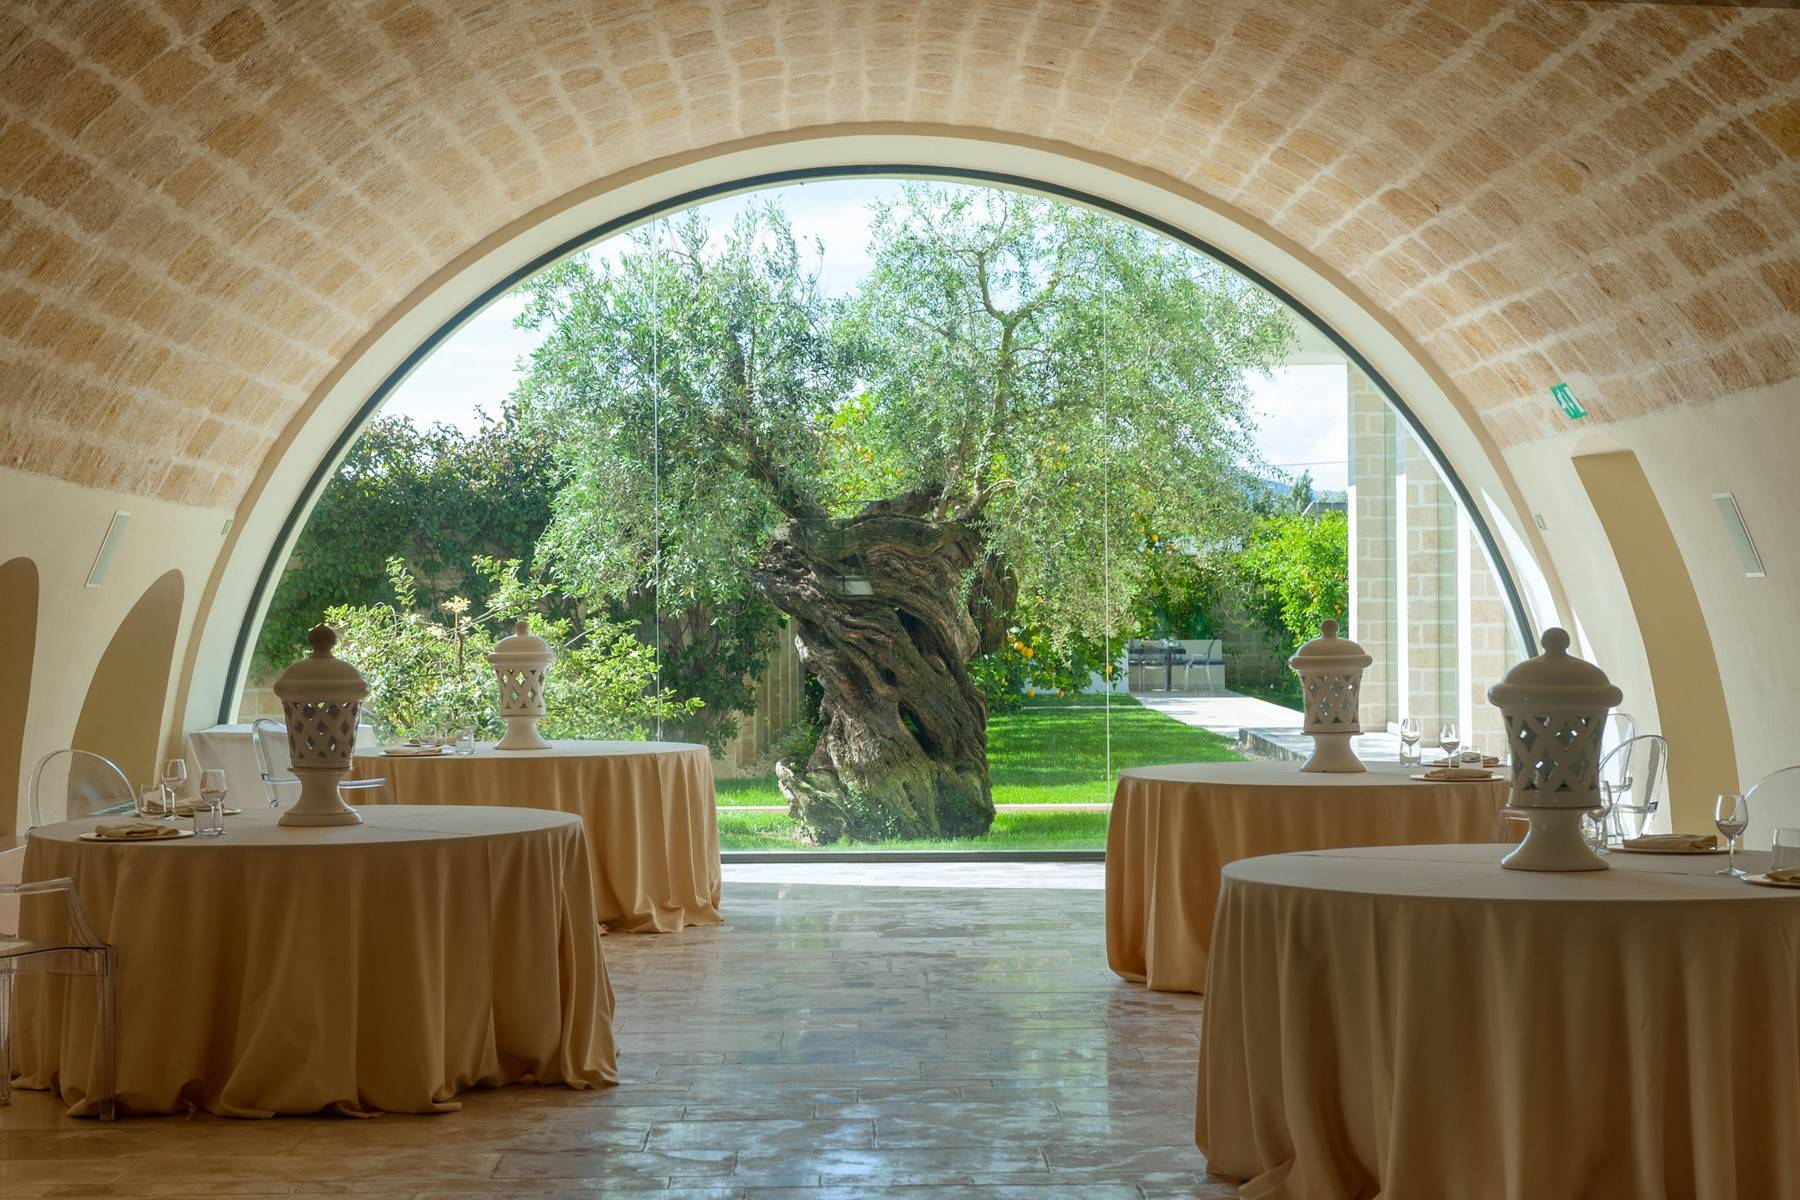 Splendida villa gentilizia del '600 circondata da agrumeti - 39